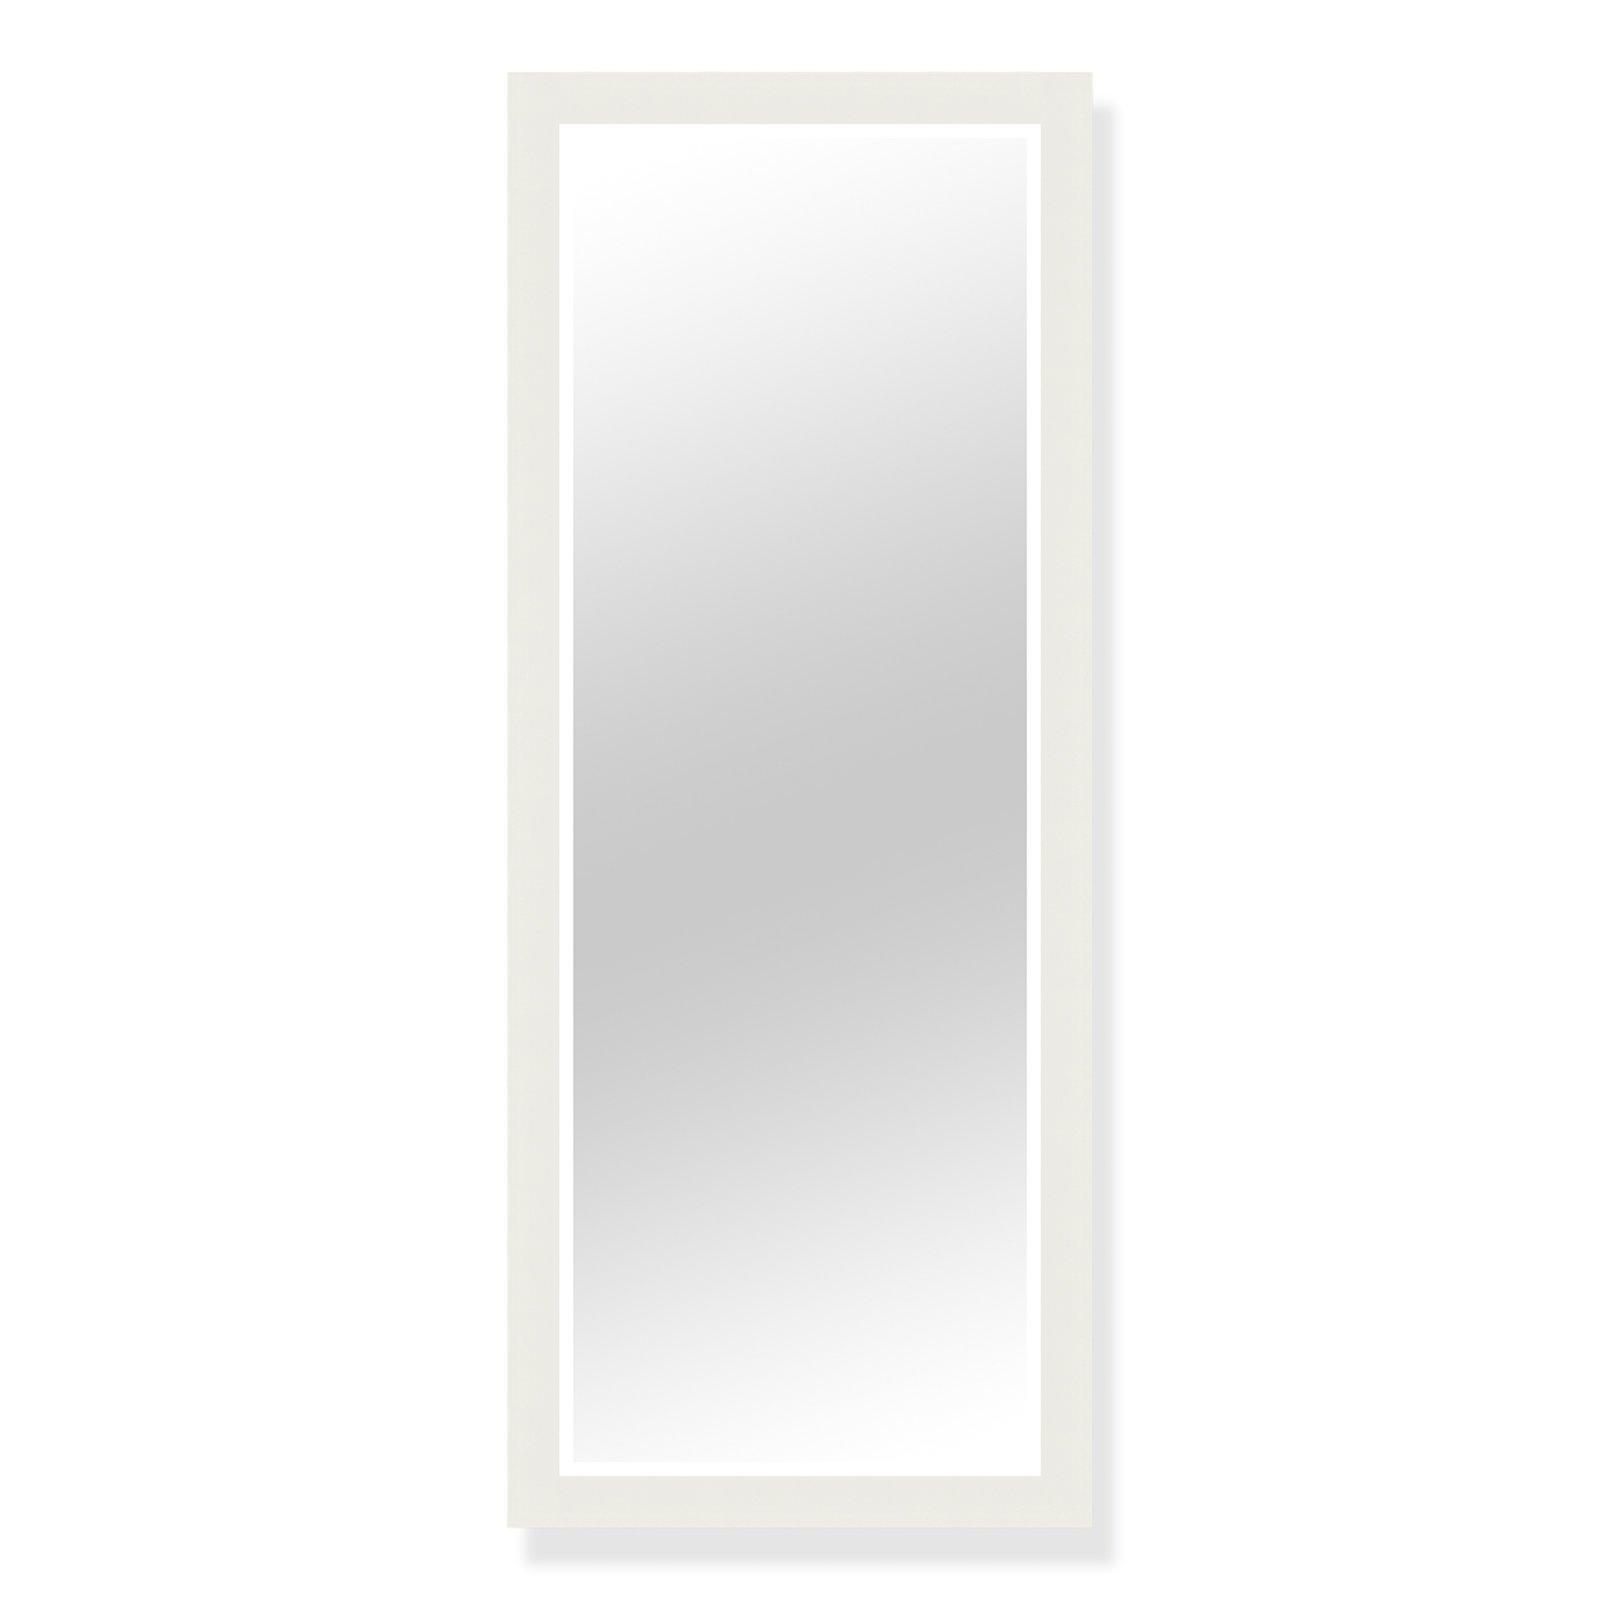 roller wandspiegel paris wei hochglanz 70x170 cm eur 59 99 picclick de. Black Bedroom Furniture Sets. Home Design Ideas